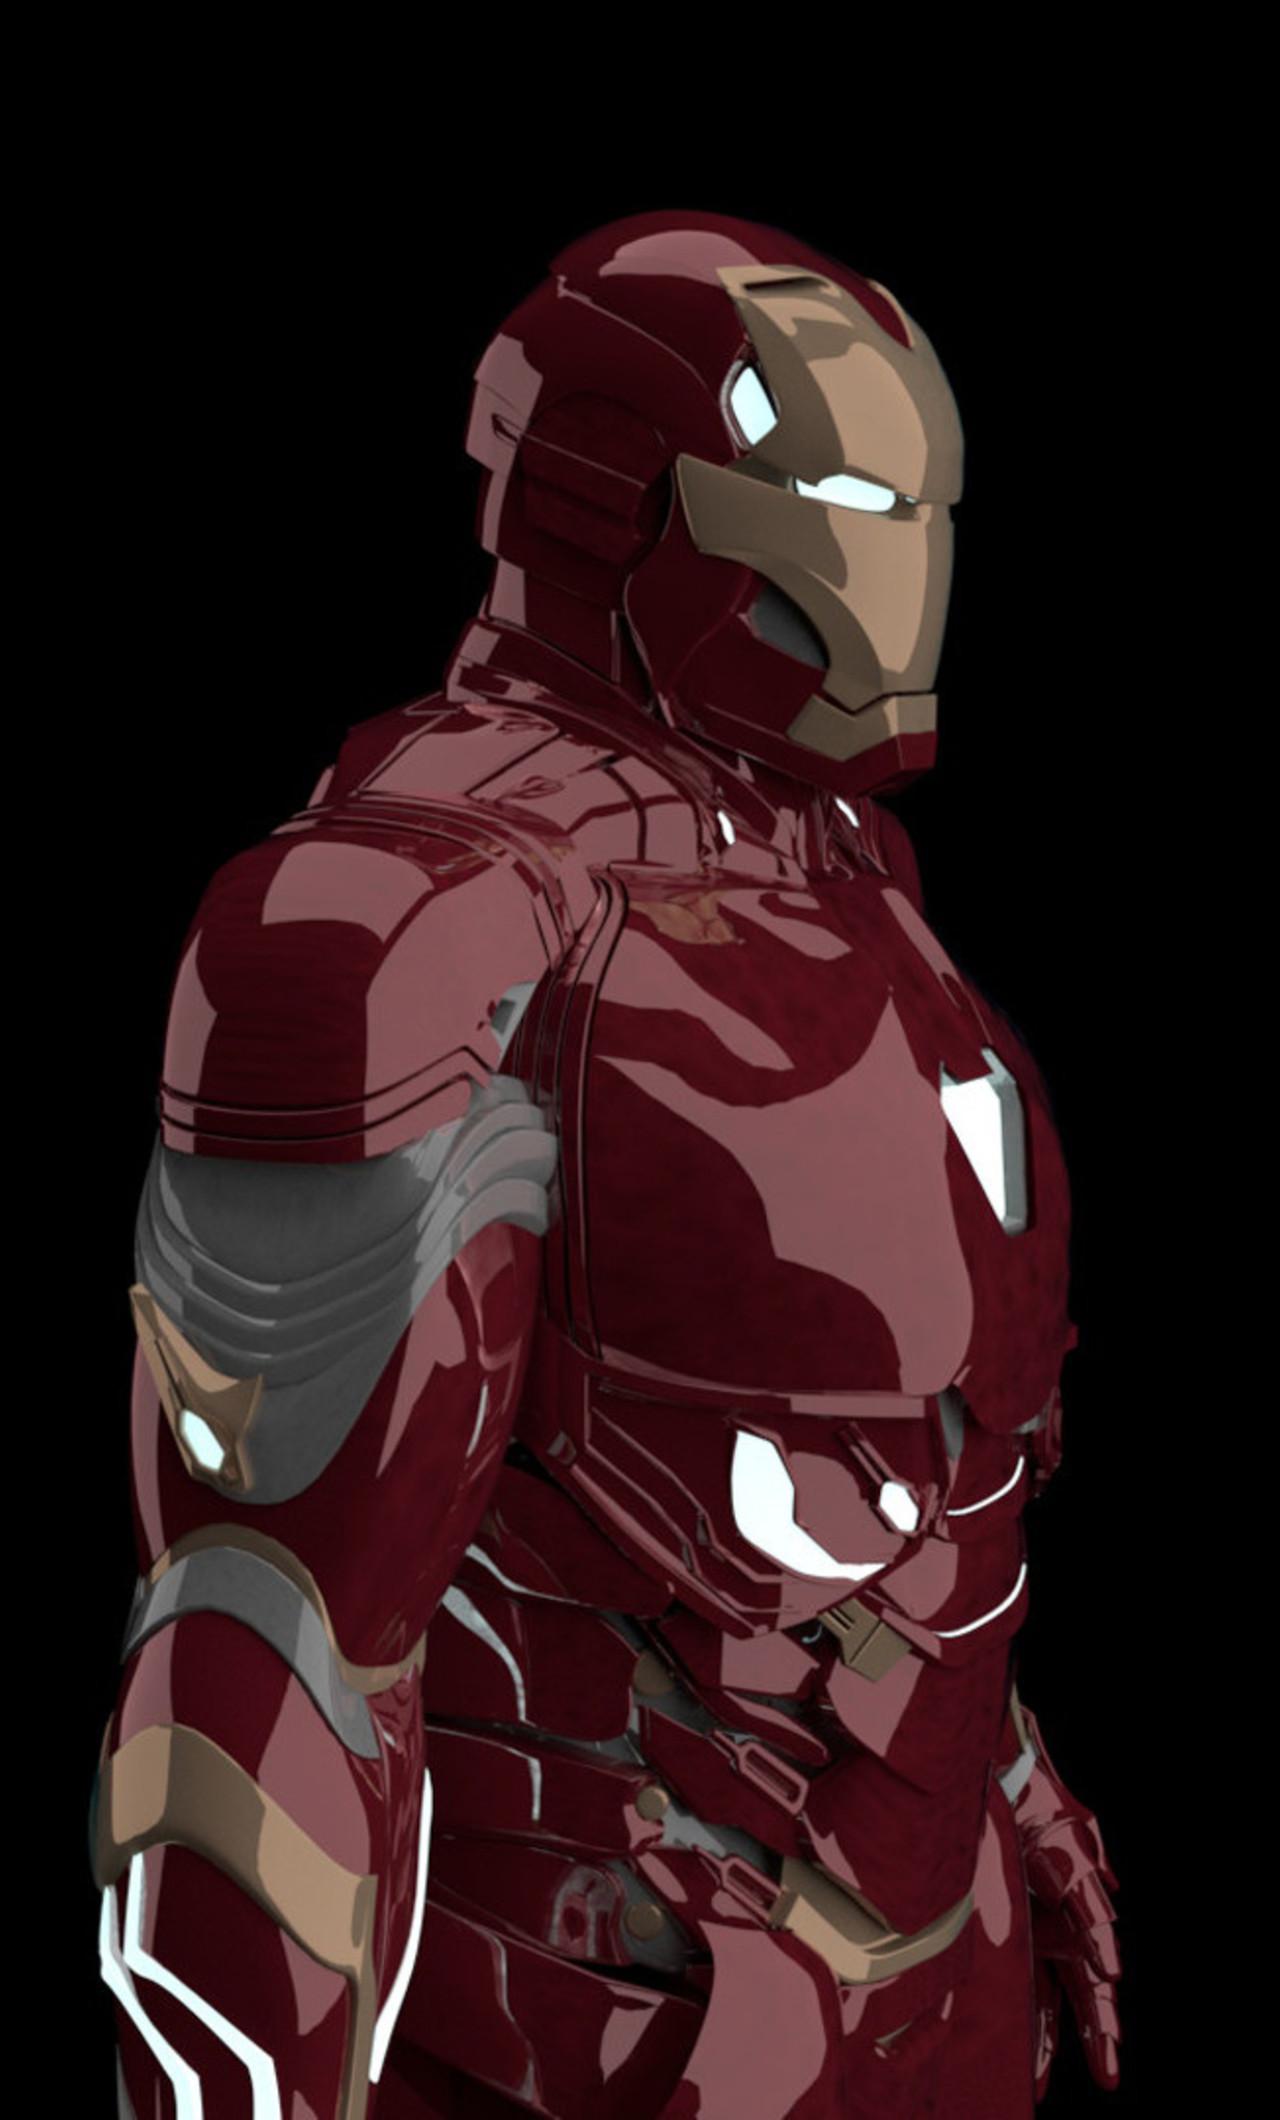 1080x1920 IPhone 6 Plus Wallpaper. Download · 1920x1080 1080x1920 Iron Man.